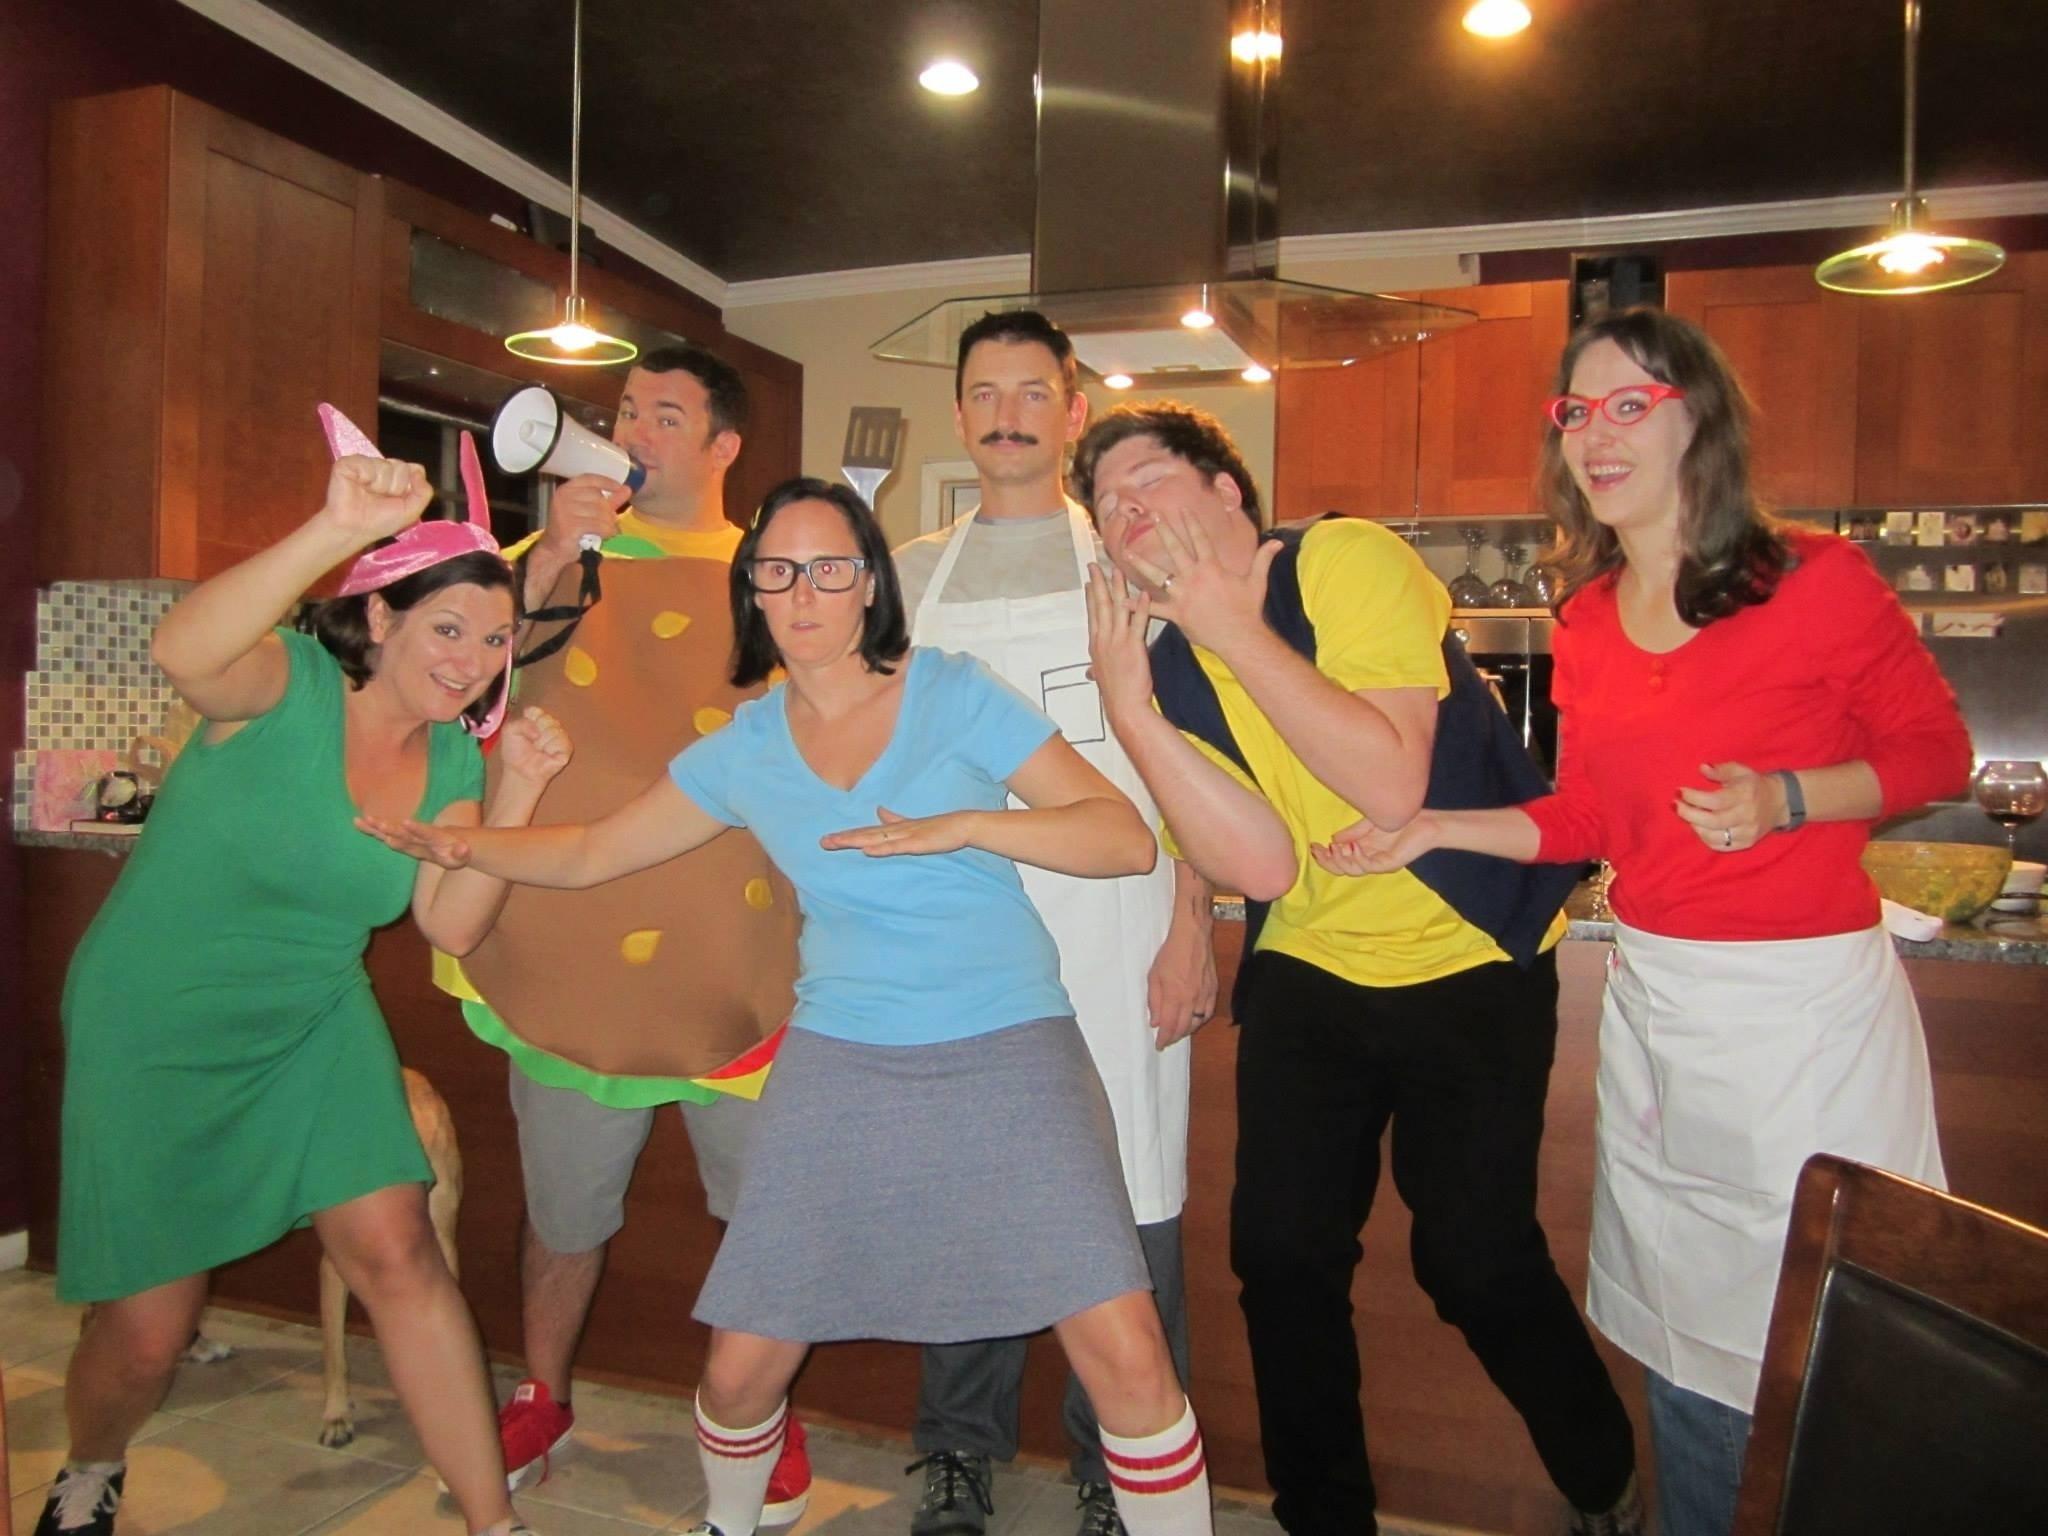 10 Cute Funny Group Halloween Costume Ideas 35 fun group halloween costumes for you and your friends group 2020